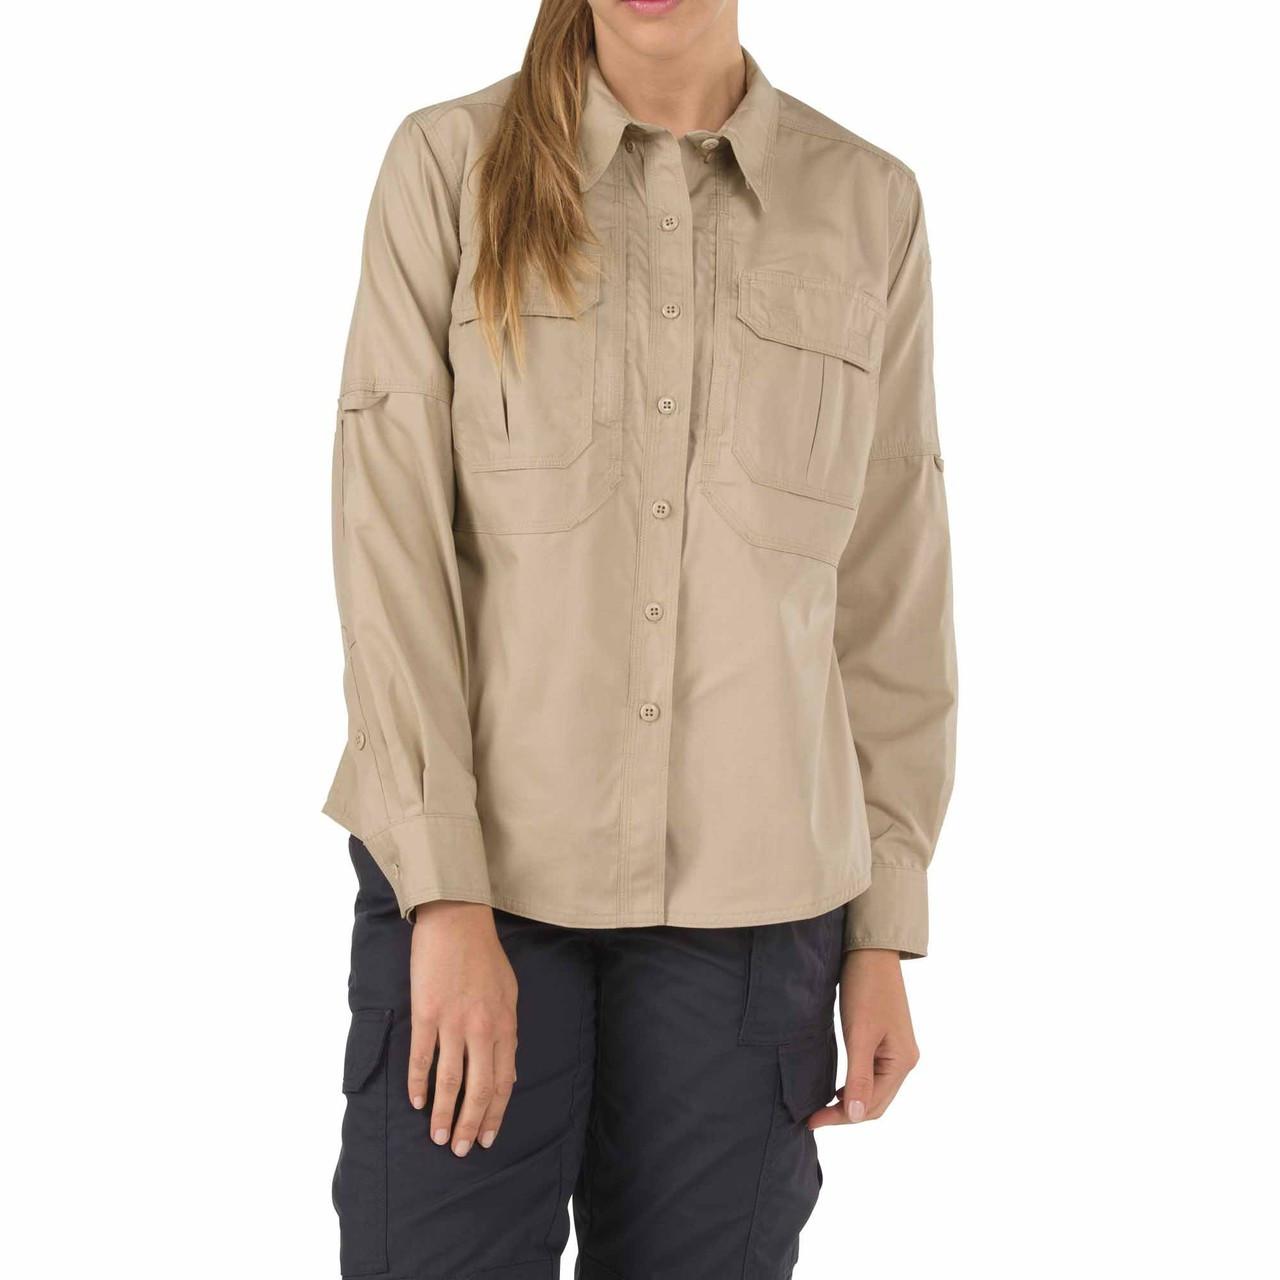 d239535e896c1 ... 5.11 Tactical Women s Taclite Pro Long Sleeve Shirt. TDU Khaki